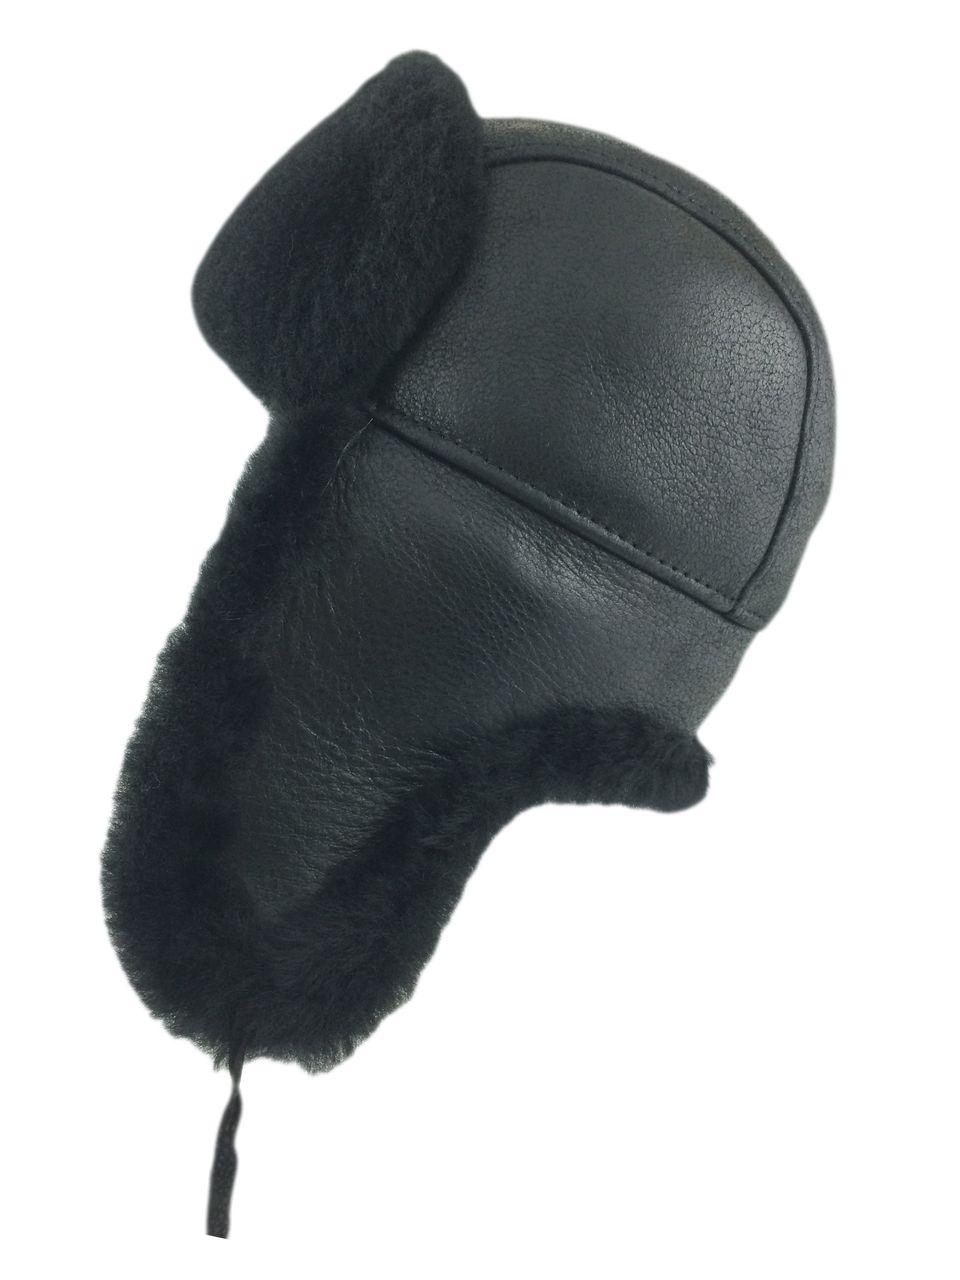 Zavelio   Genuine Sheepskin Coats, Jackets and Hats - Shearling Sheepskin Aviator Bomber Fur Hat - Solid Black, $ 79.99 (http://www.zavelio.com/sheepskin-hats/aviator-bomber-hats/shearling-sheepskin-aviator-bomber-fur-hat-solid-black/)